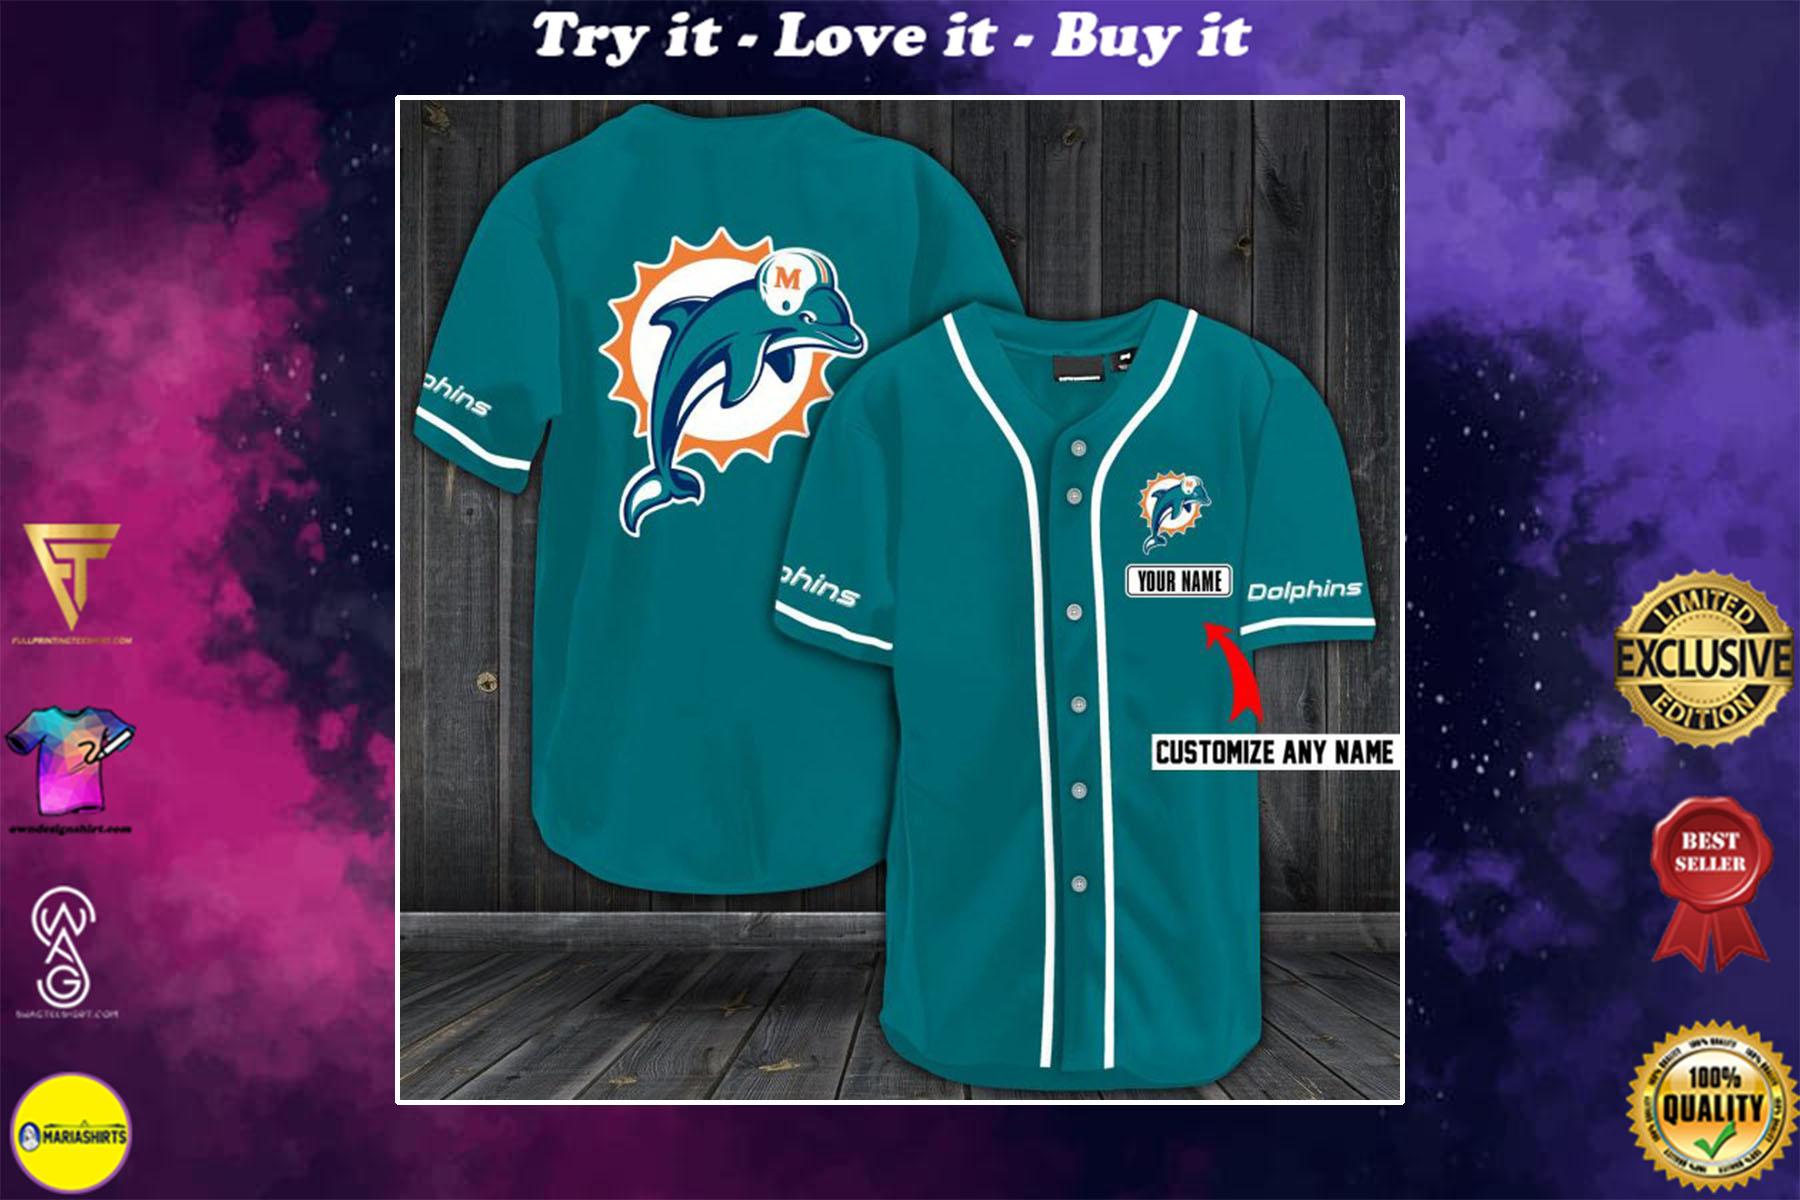 personalized name miami dolphins baseball shirt